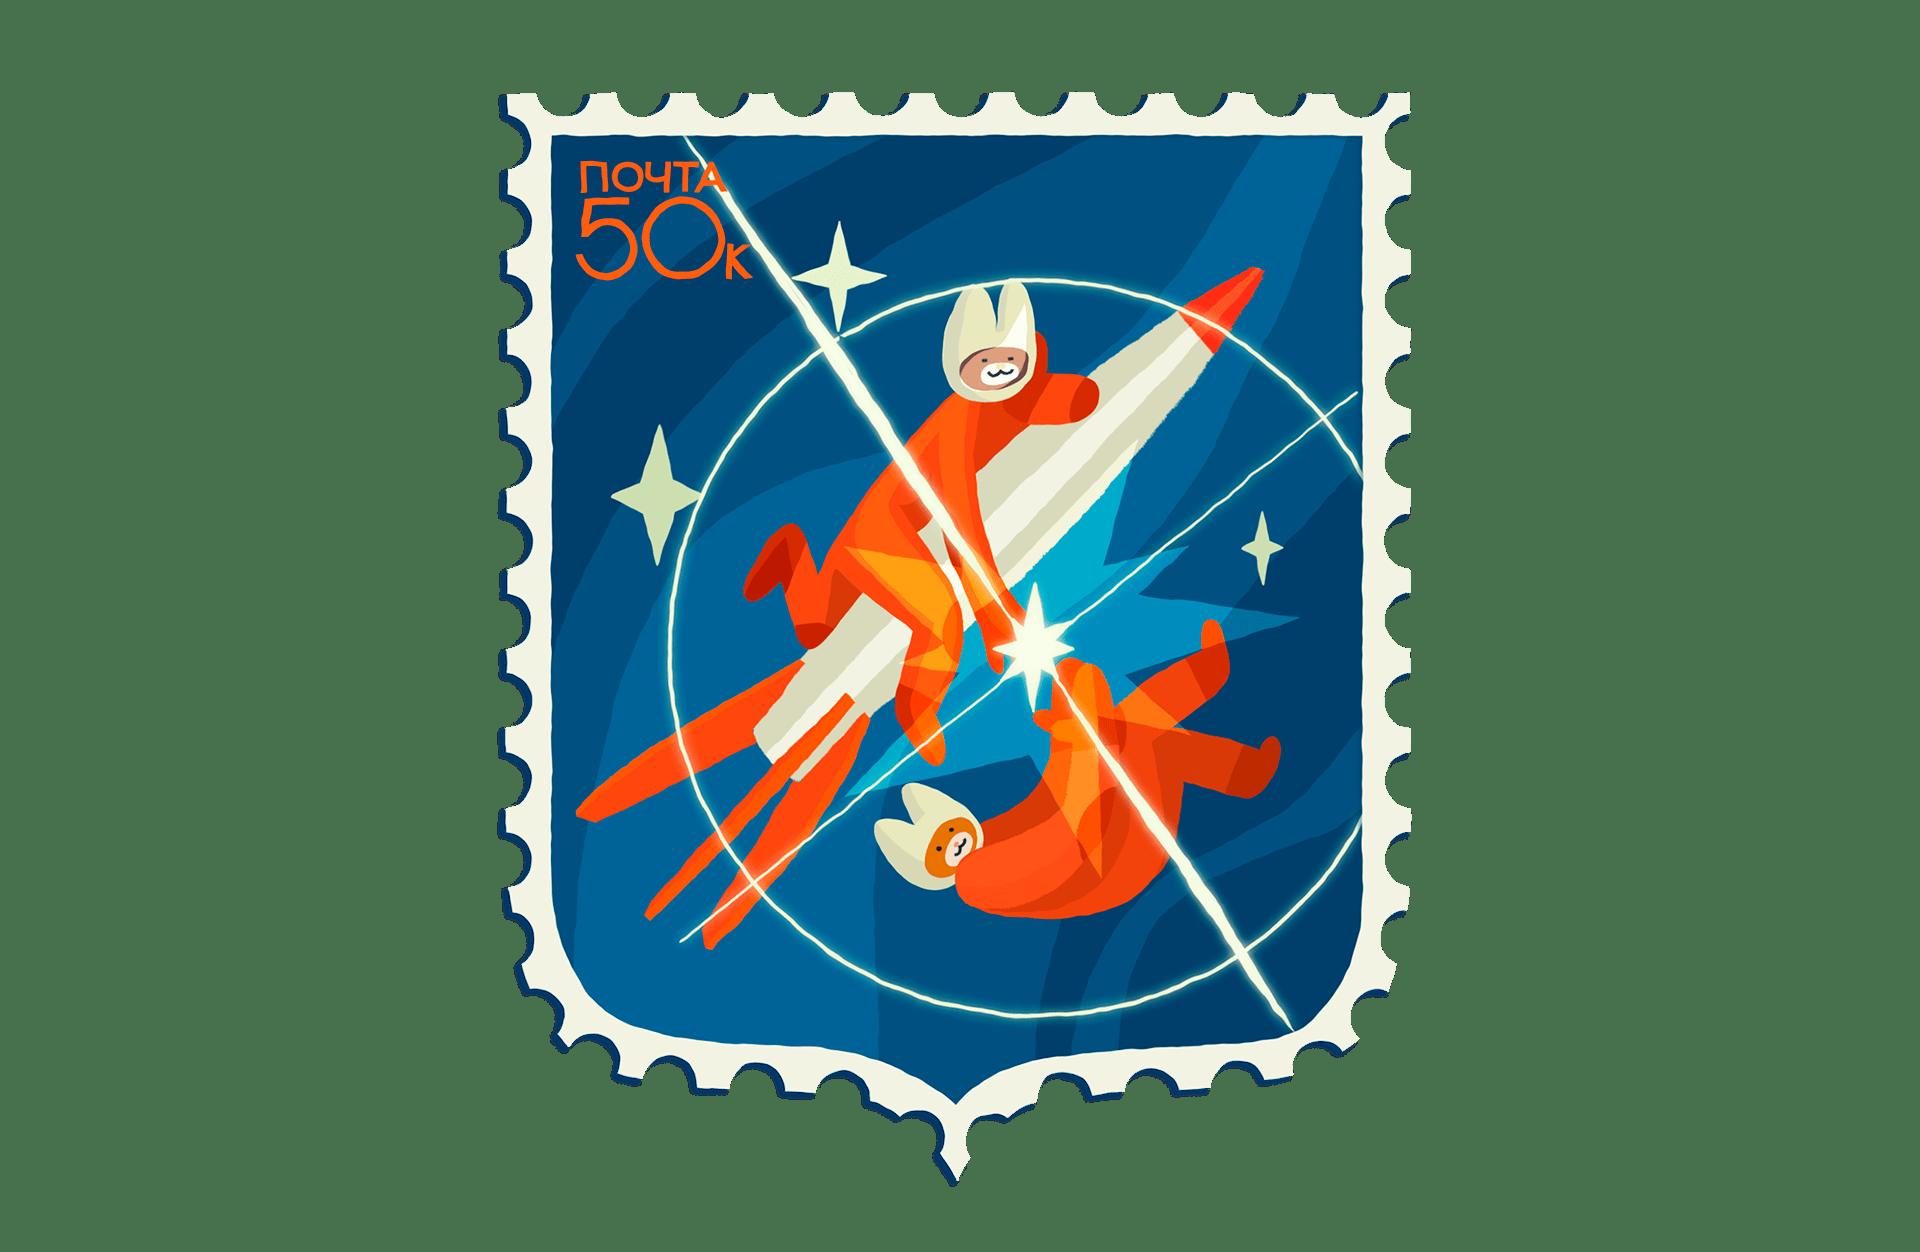 17 - Новый герб Москвы